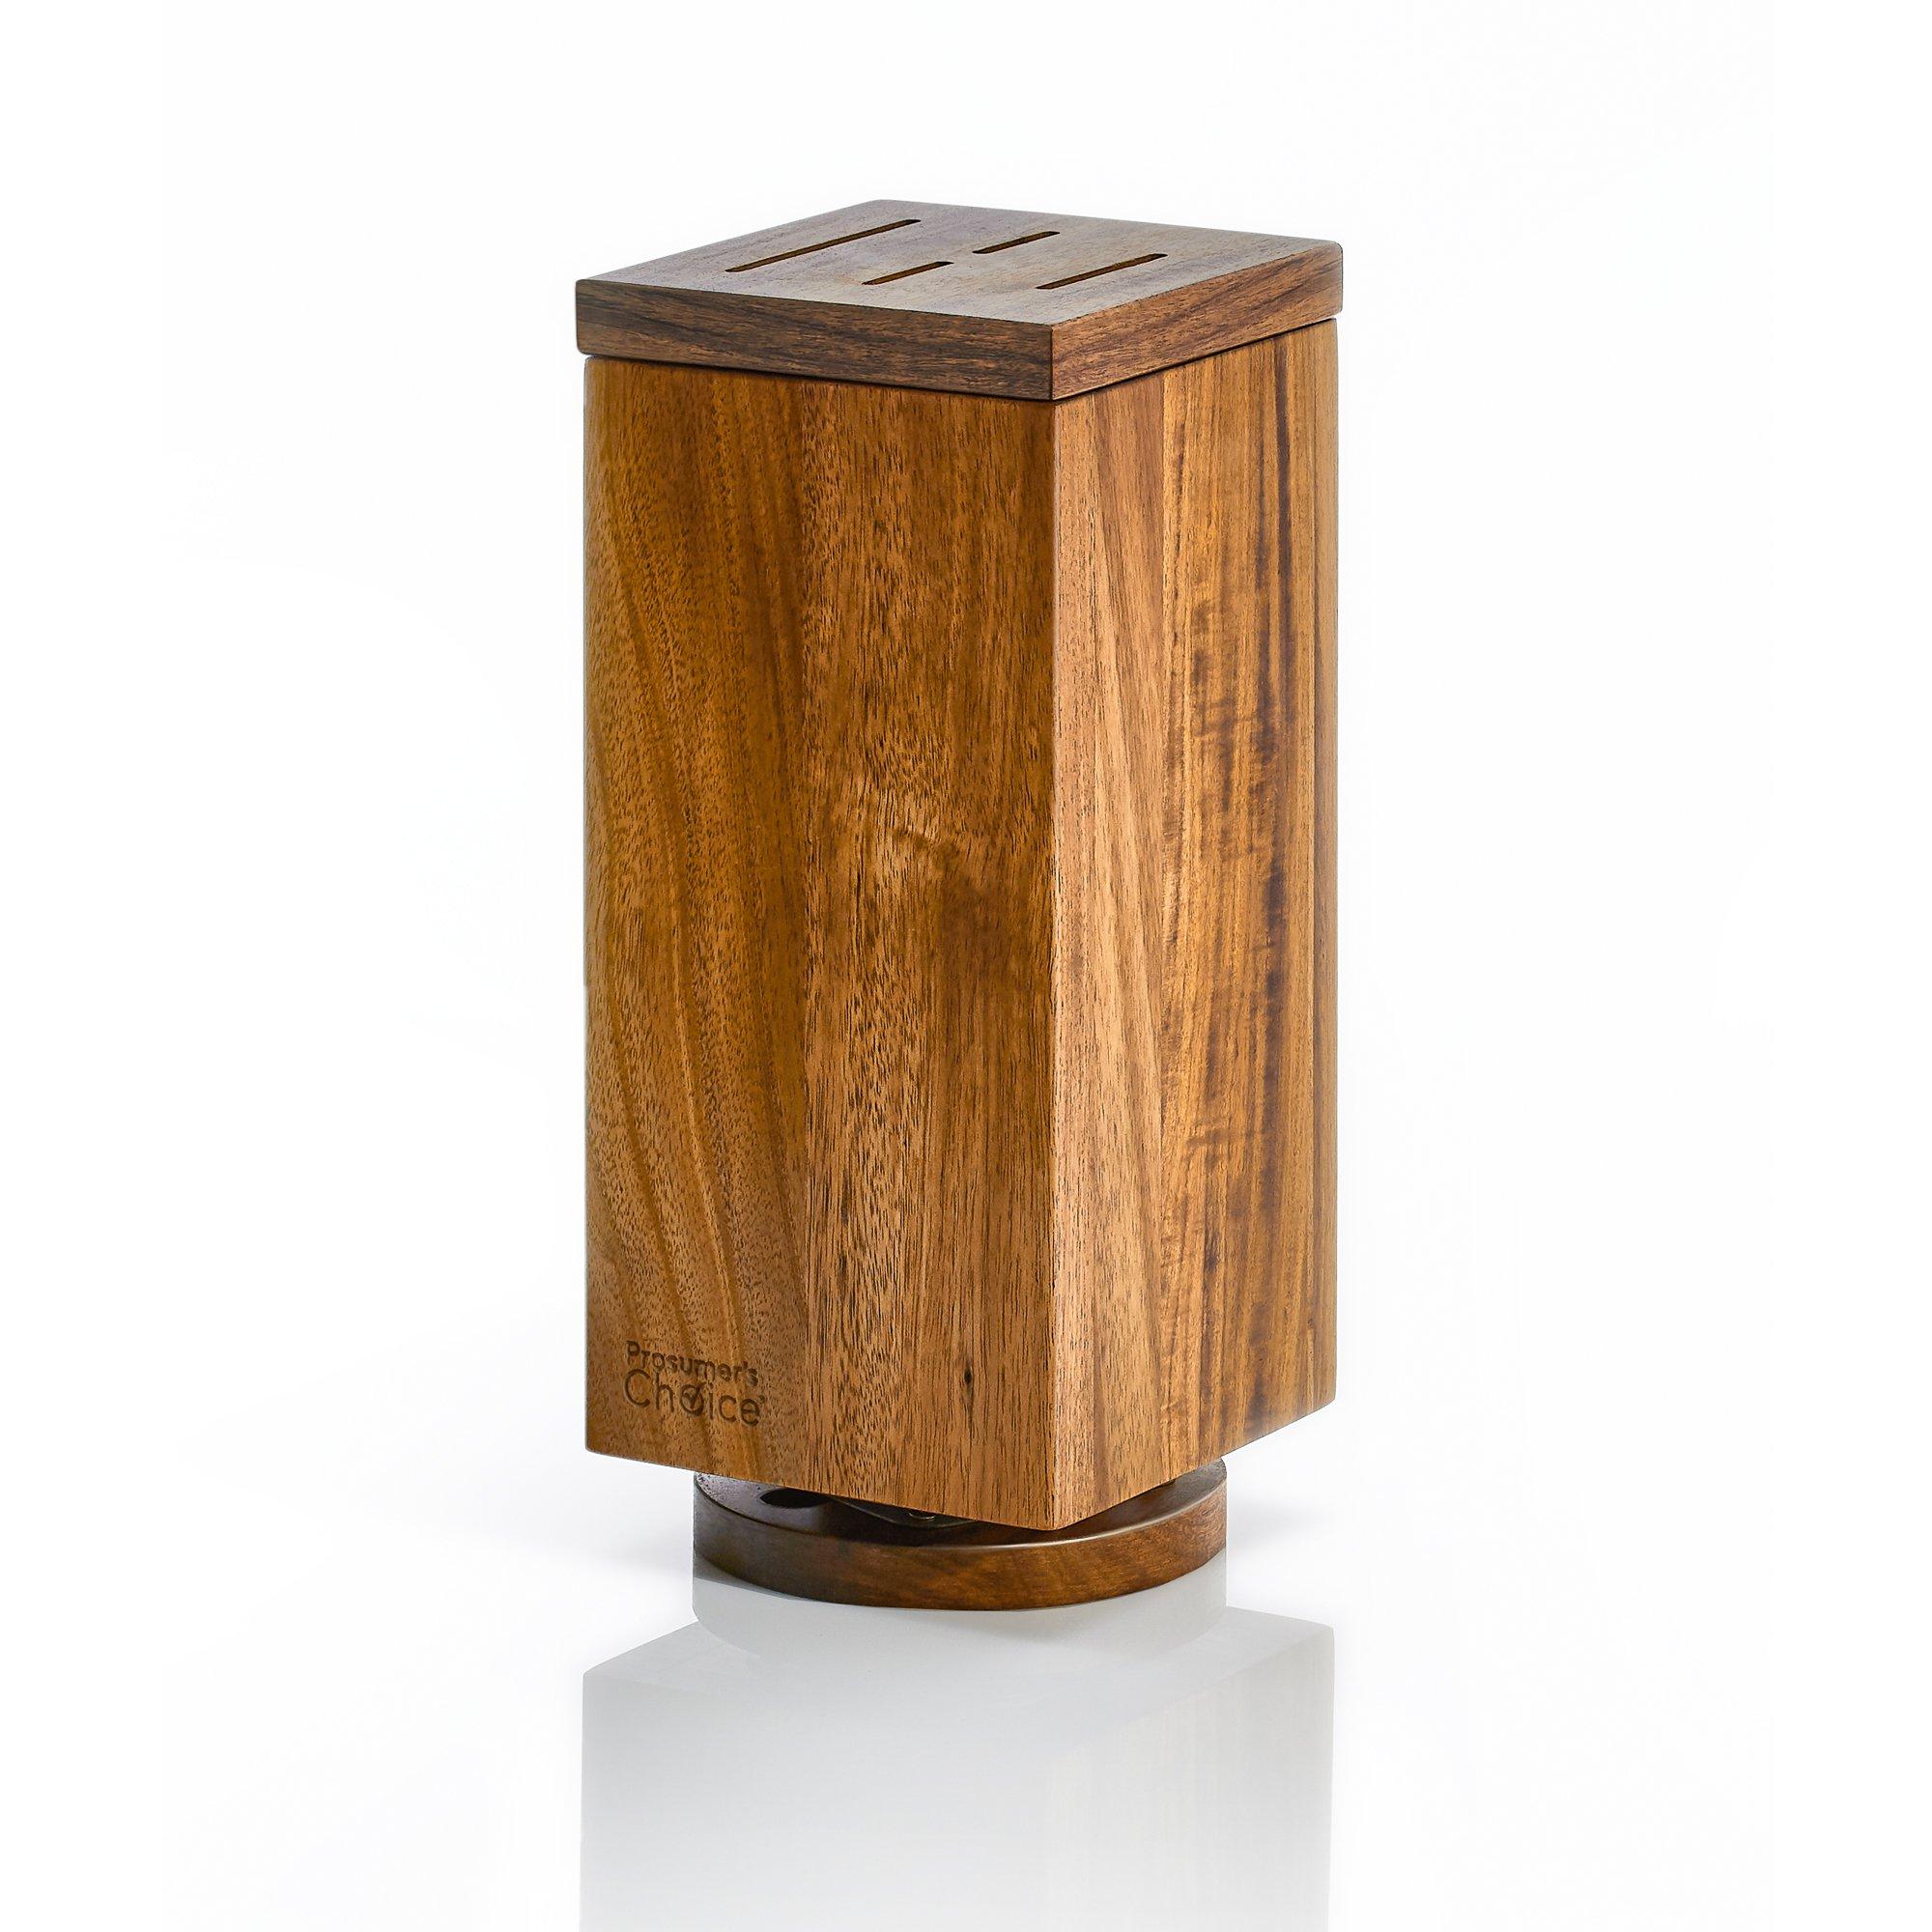 "Prosumer's Choice Universal 360° Rotating Wooden Knife Block | Utensil Holder w/Magnetic Sides – Large 11.5"" tall"